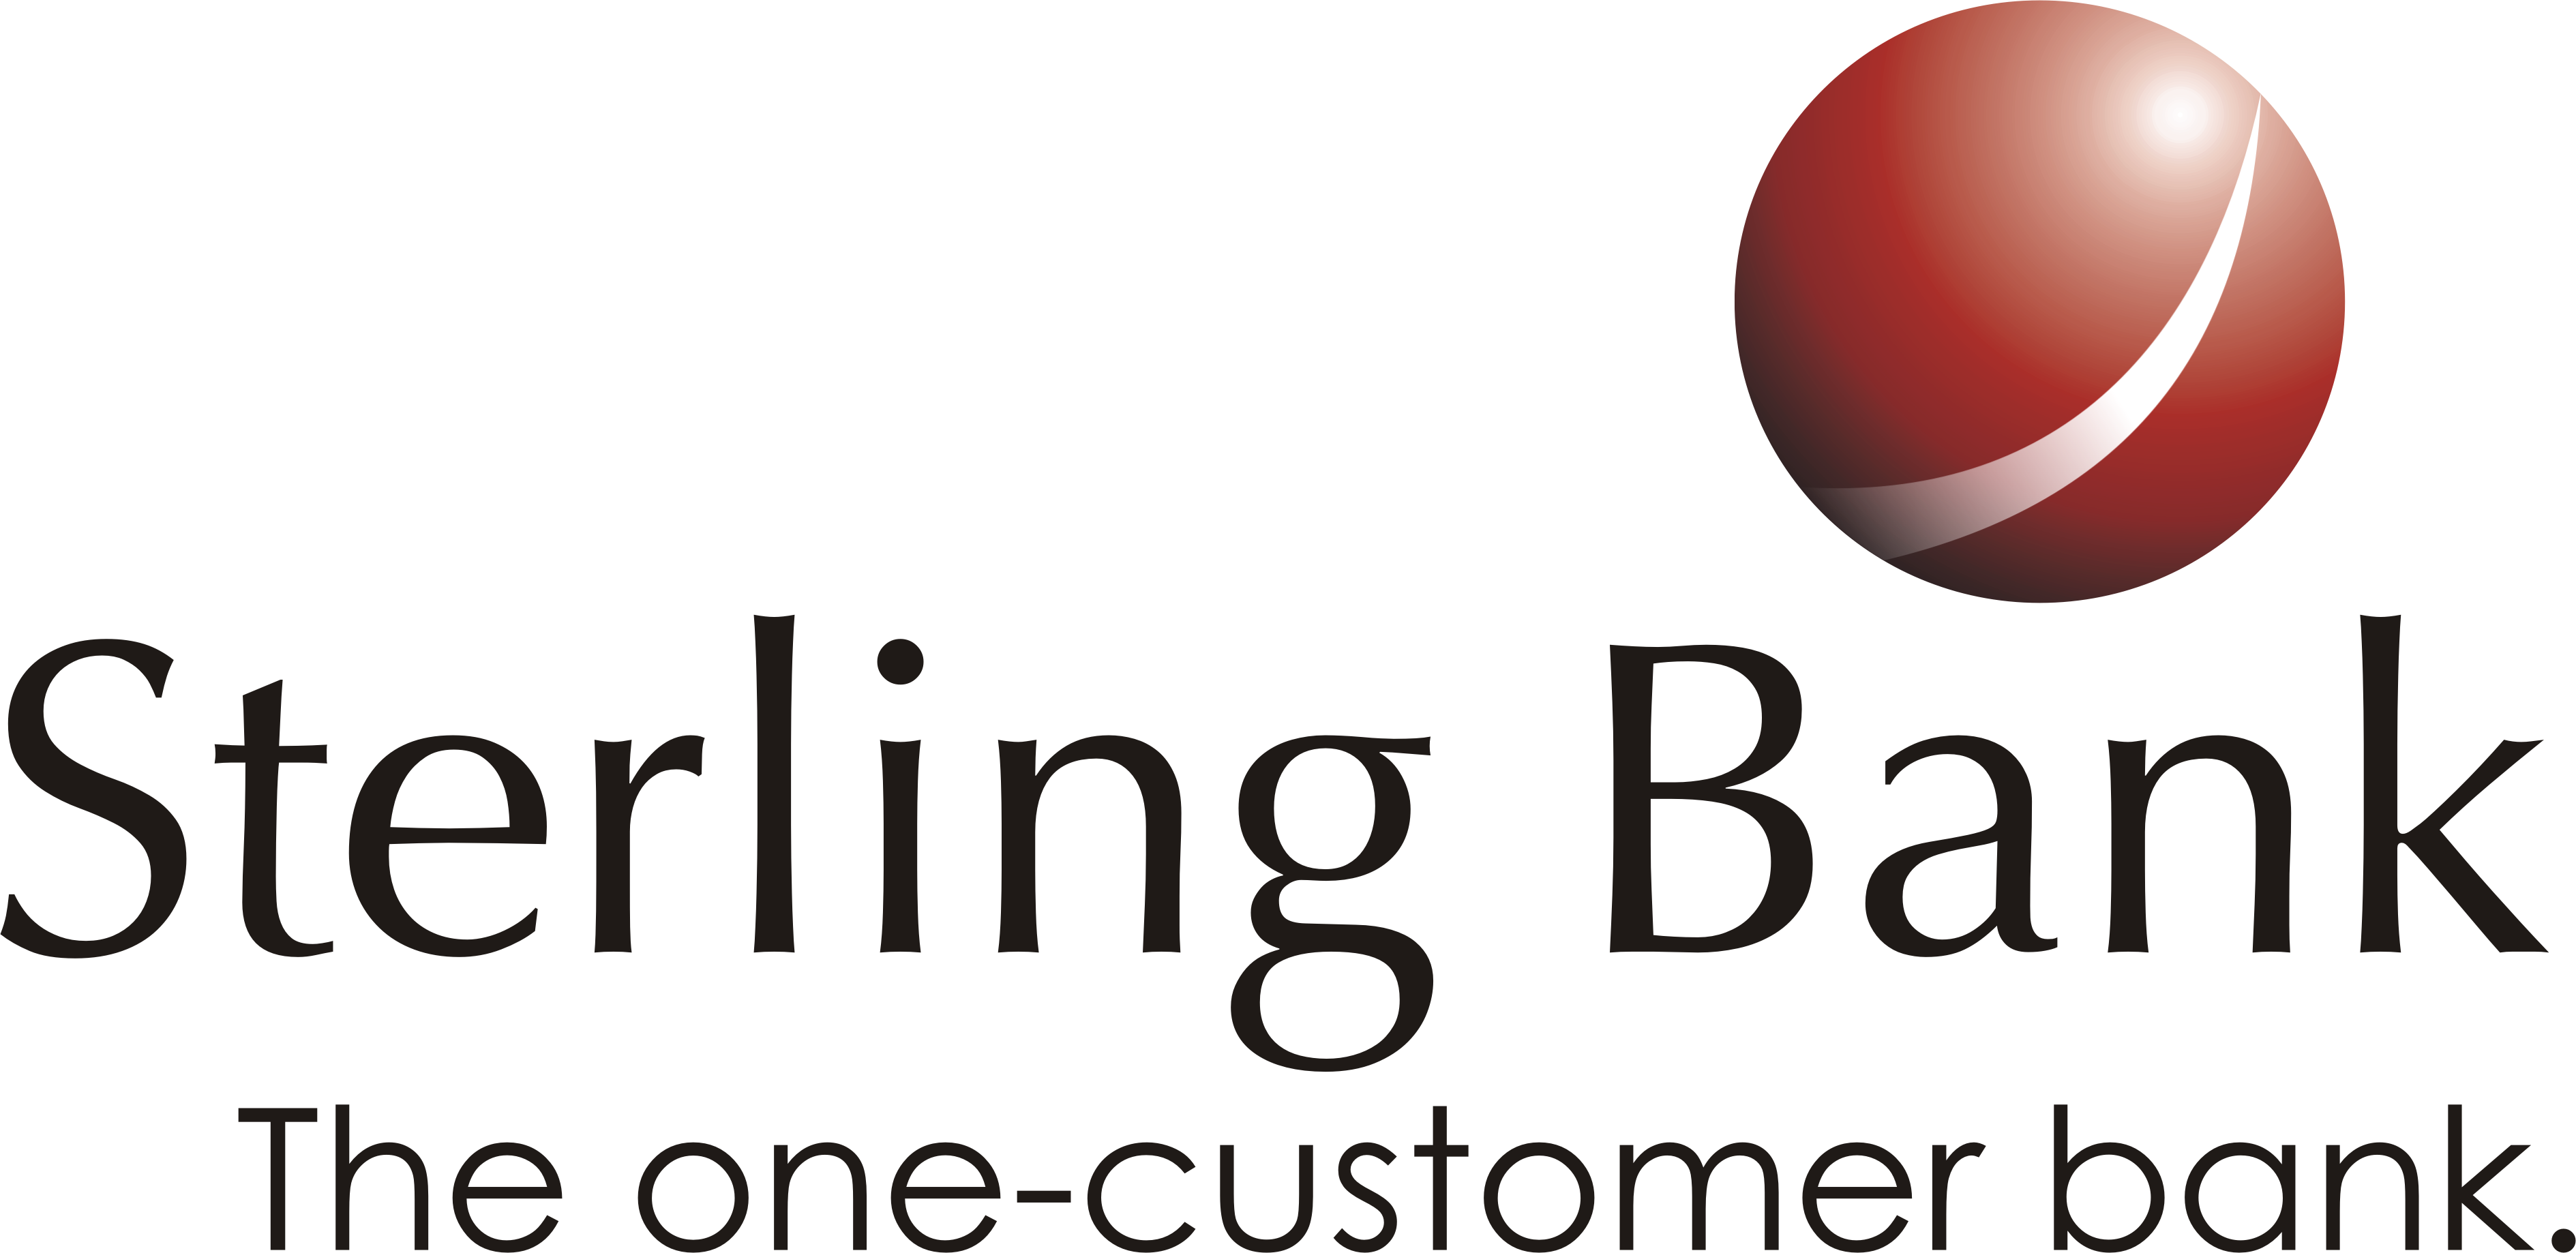 Sterling Bank Loses N1.8b to Two Alleged Fraudsters